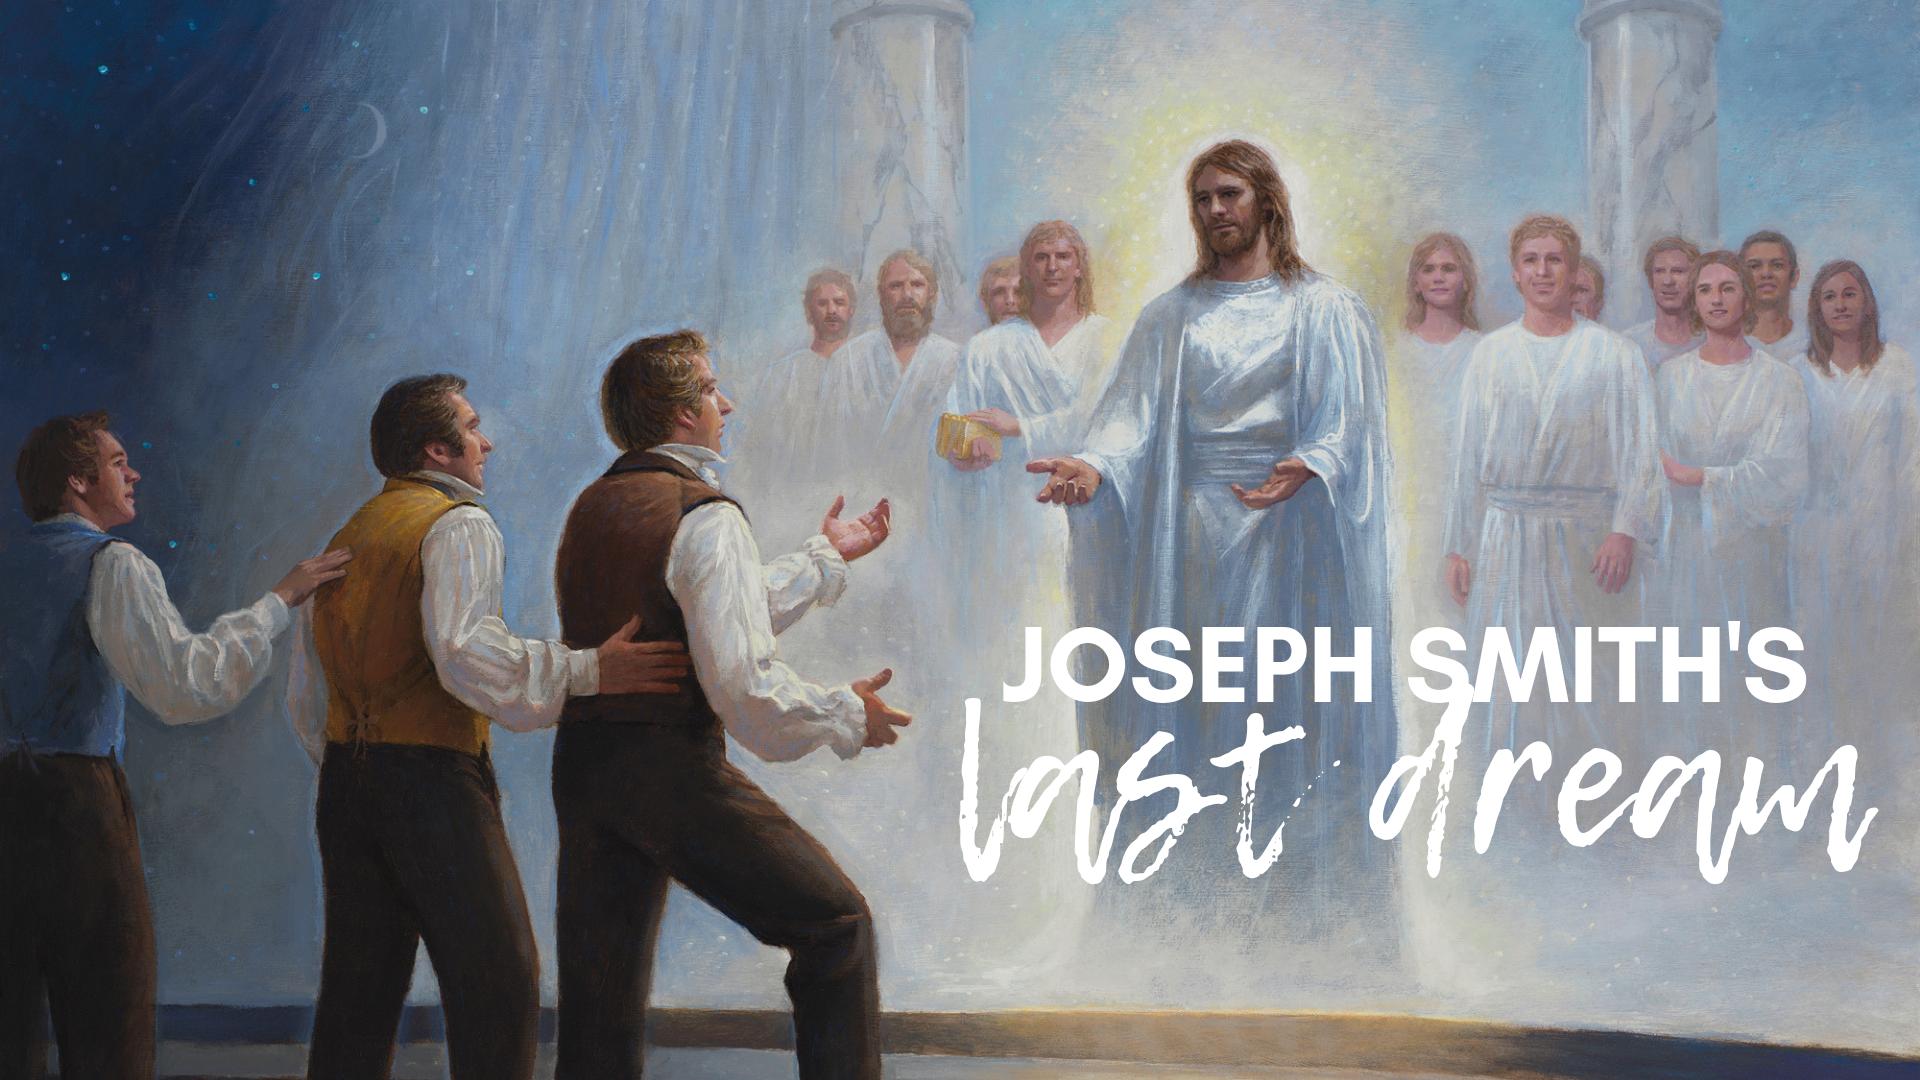 Joseph Smith's Last Dream